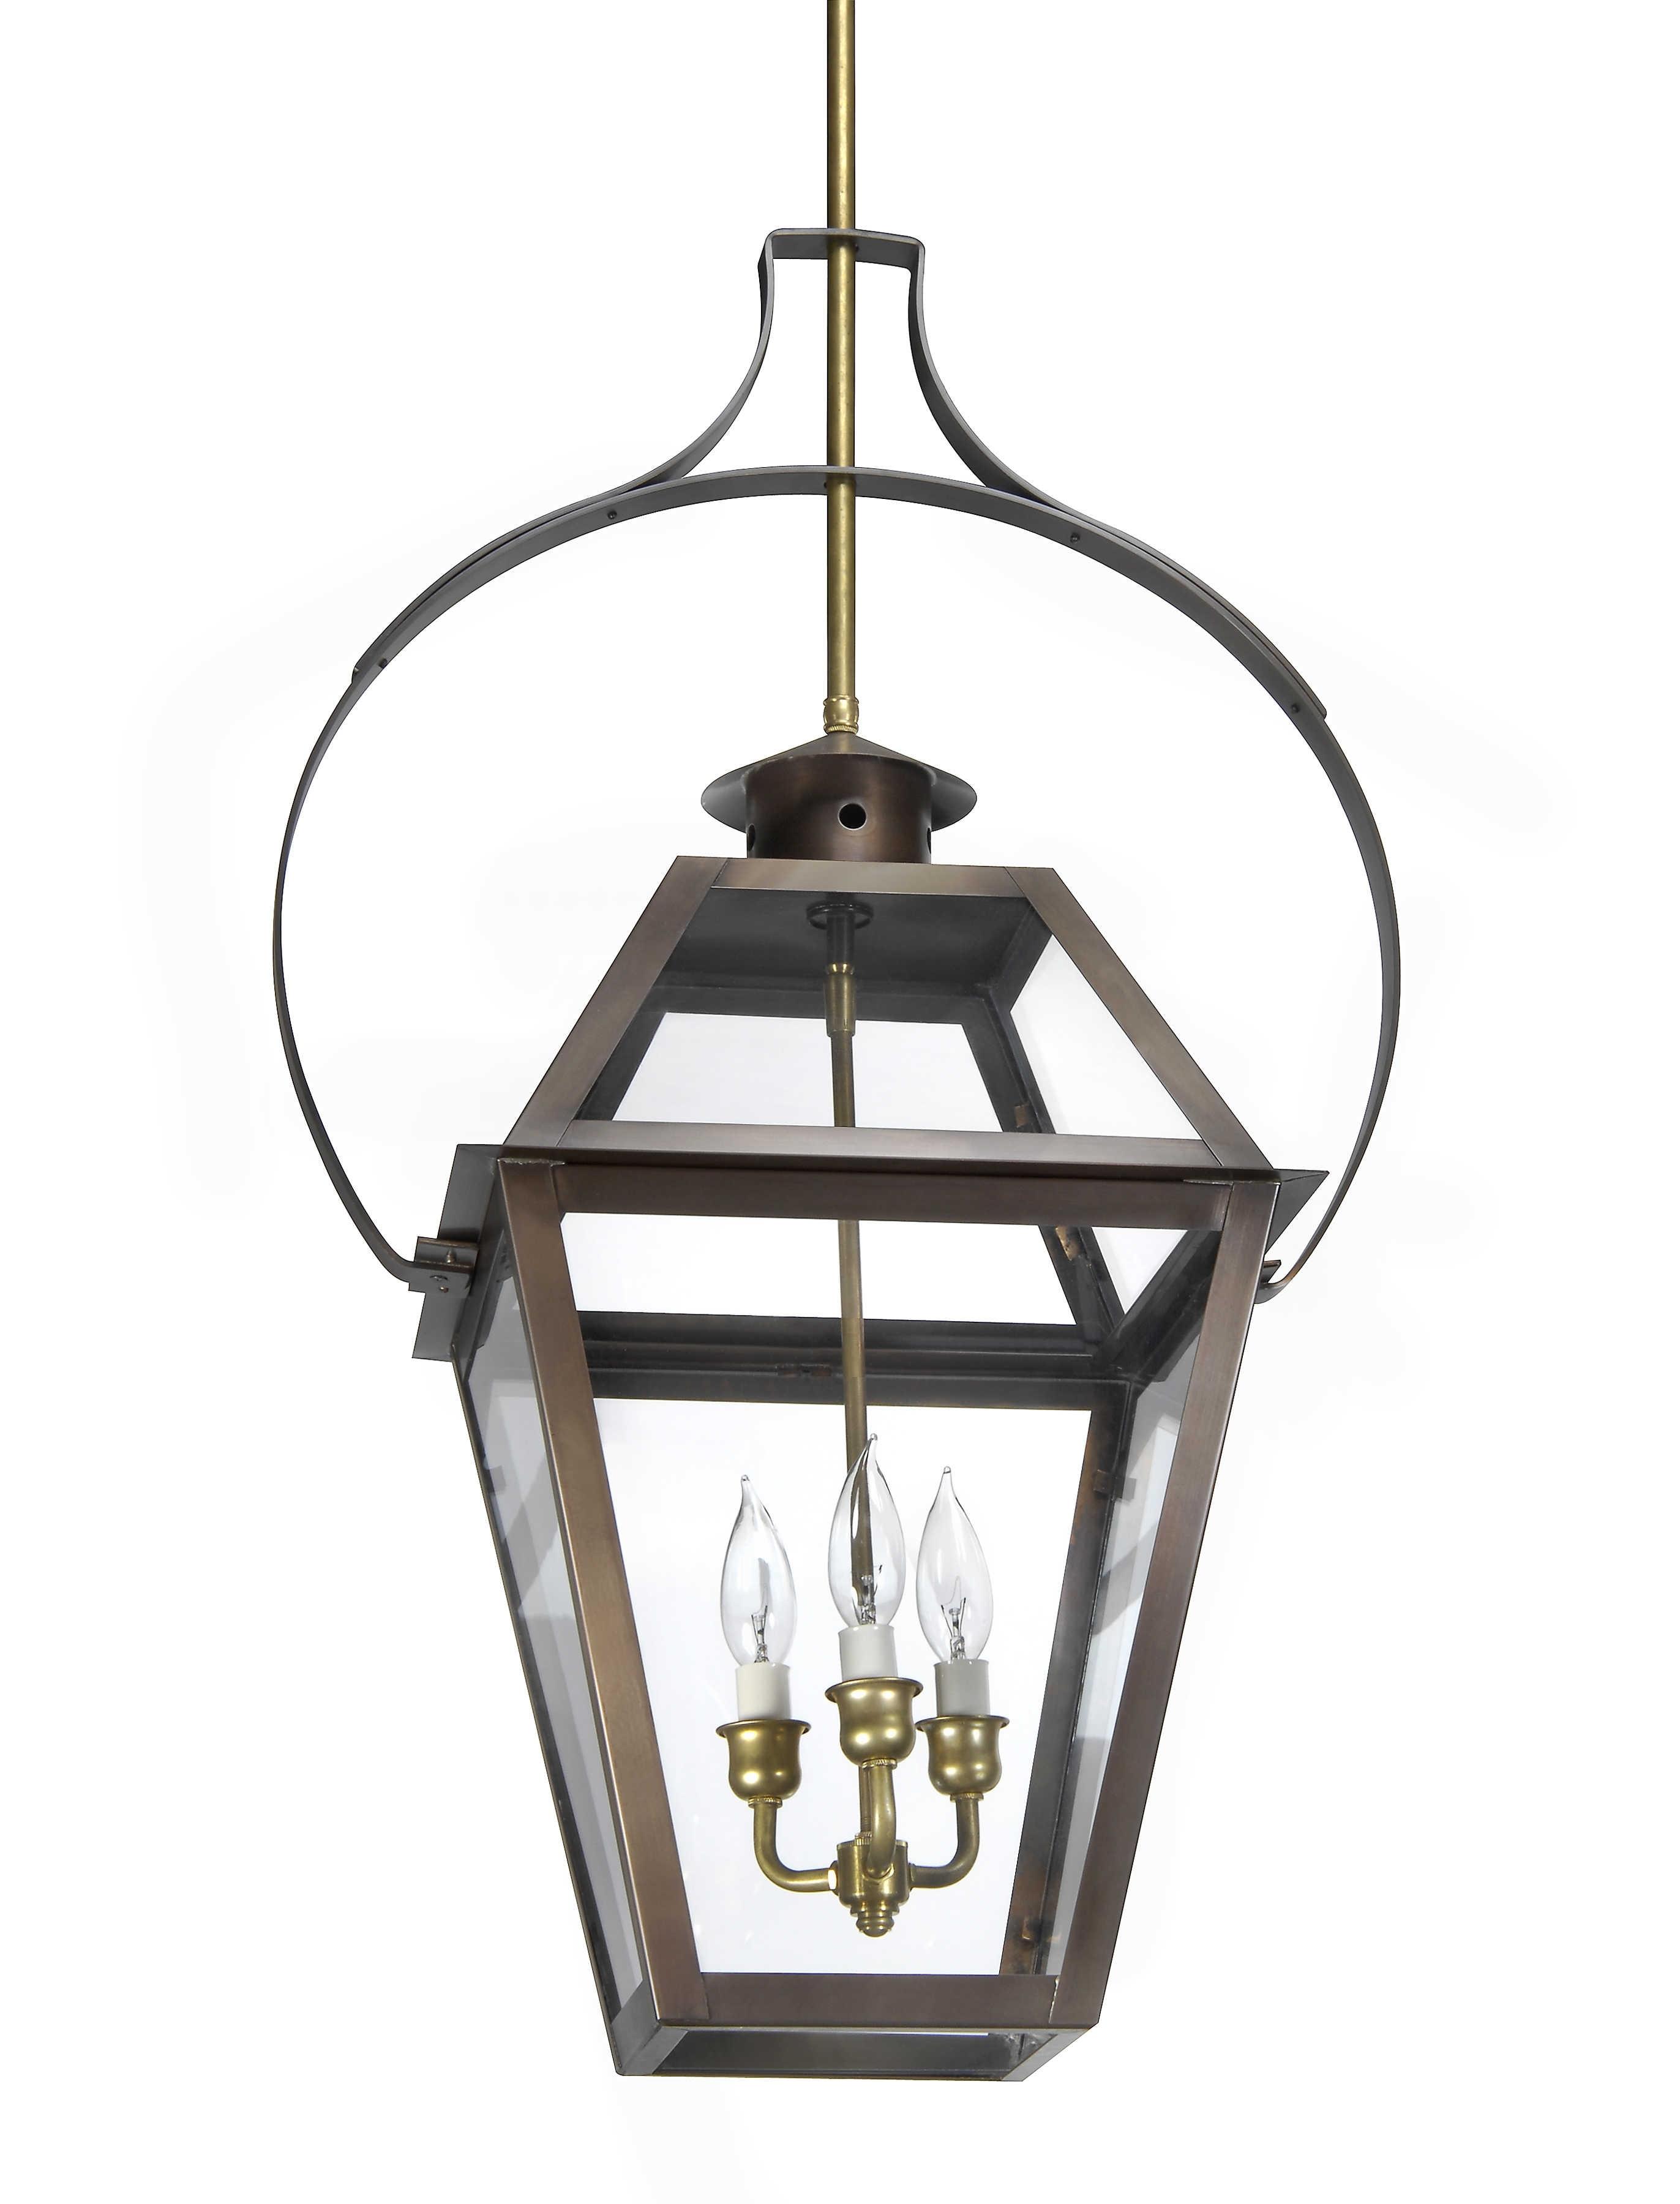 Charleston Collection | Ch 23 Hanging Yoke Light– Lantern & Scroll Throughout Outdoor Electric Lanterns (View 3 of 20)